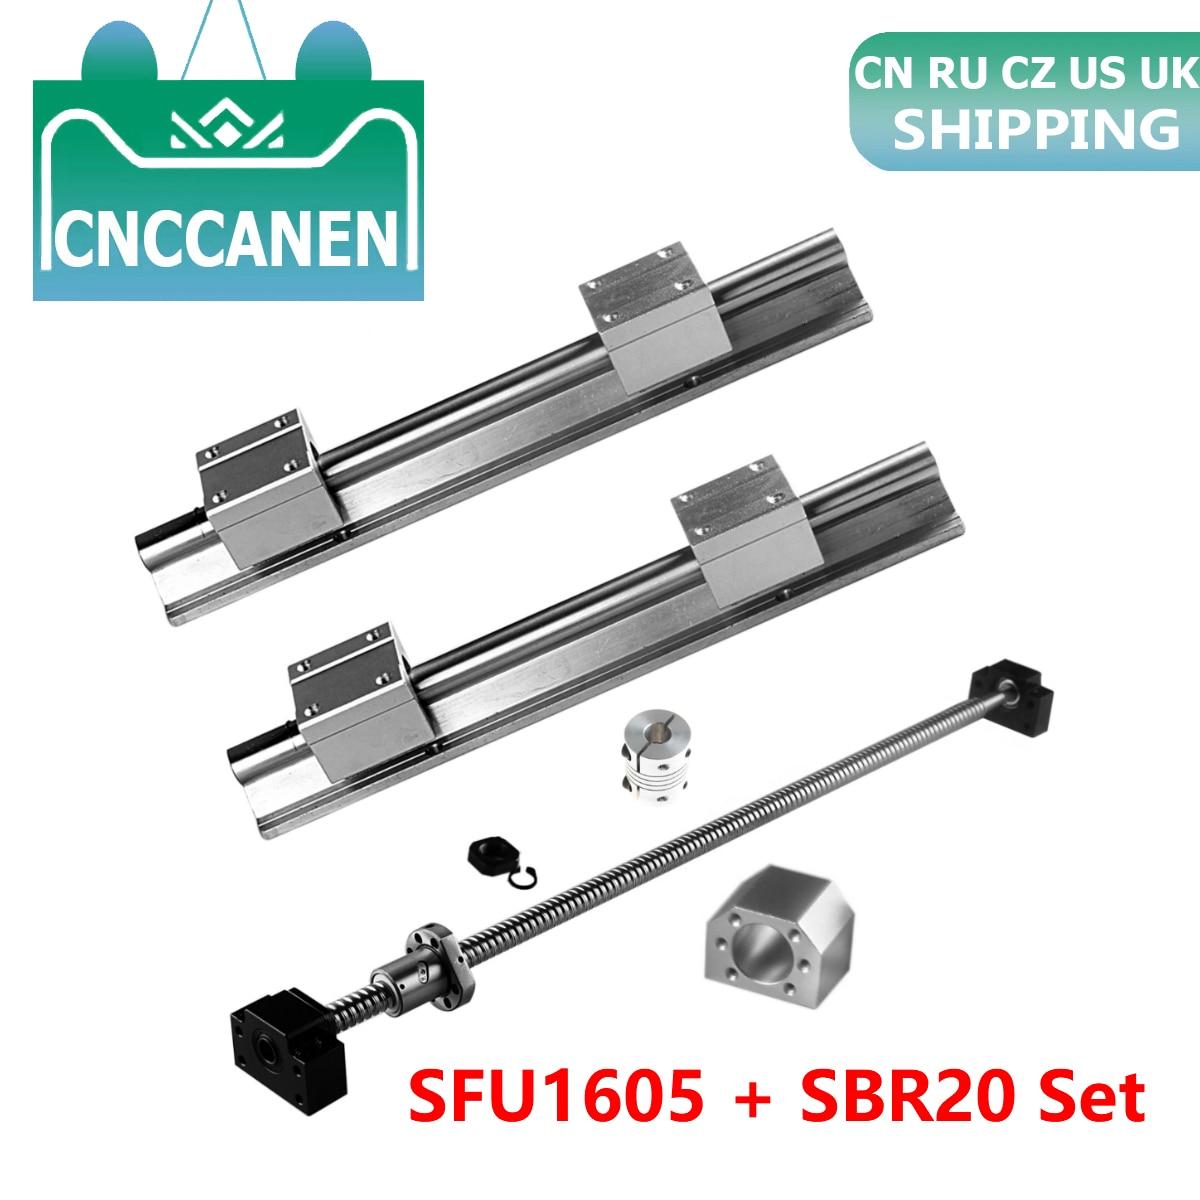 2PCS SBR20 Linear Rail Support+4pcs SBR20UU Block Bearing+SFU1605 Ball Screw End Machined+Nut Housing+BKBF12 Support+Coupler Set